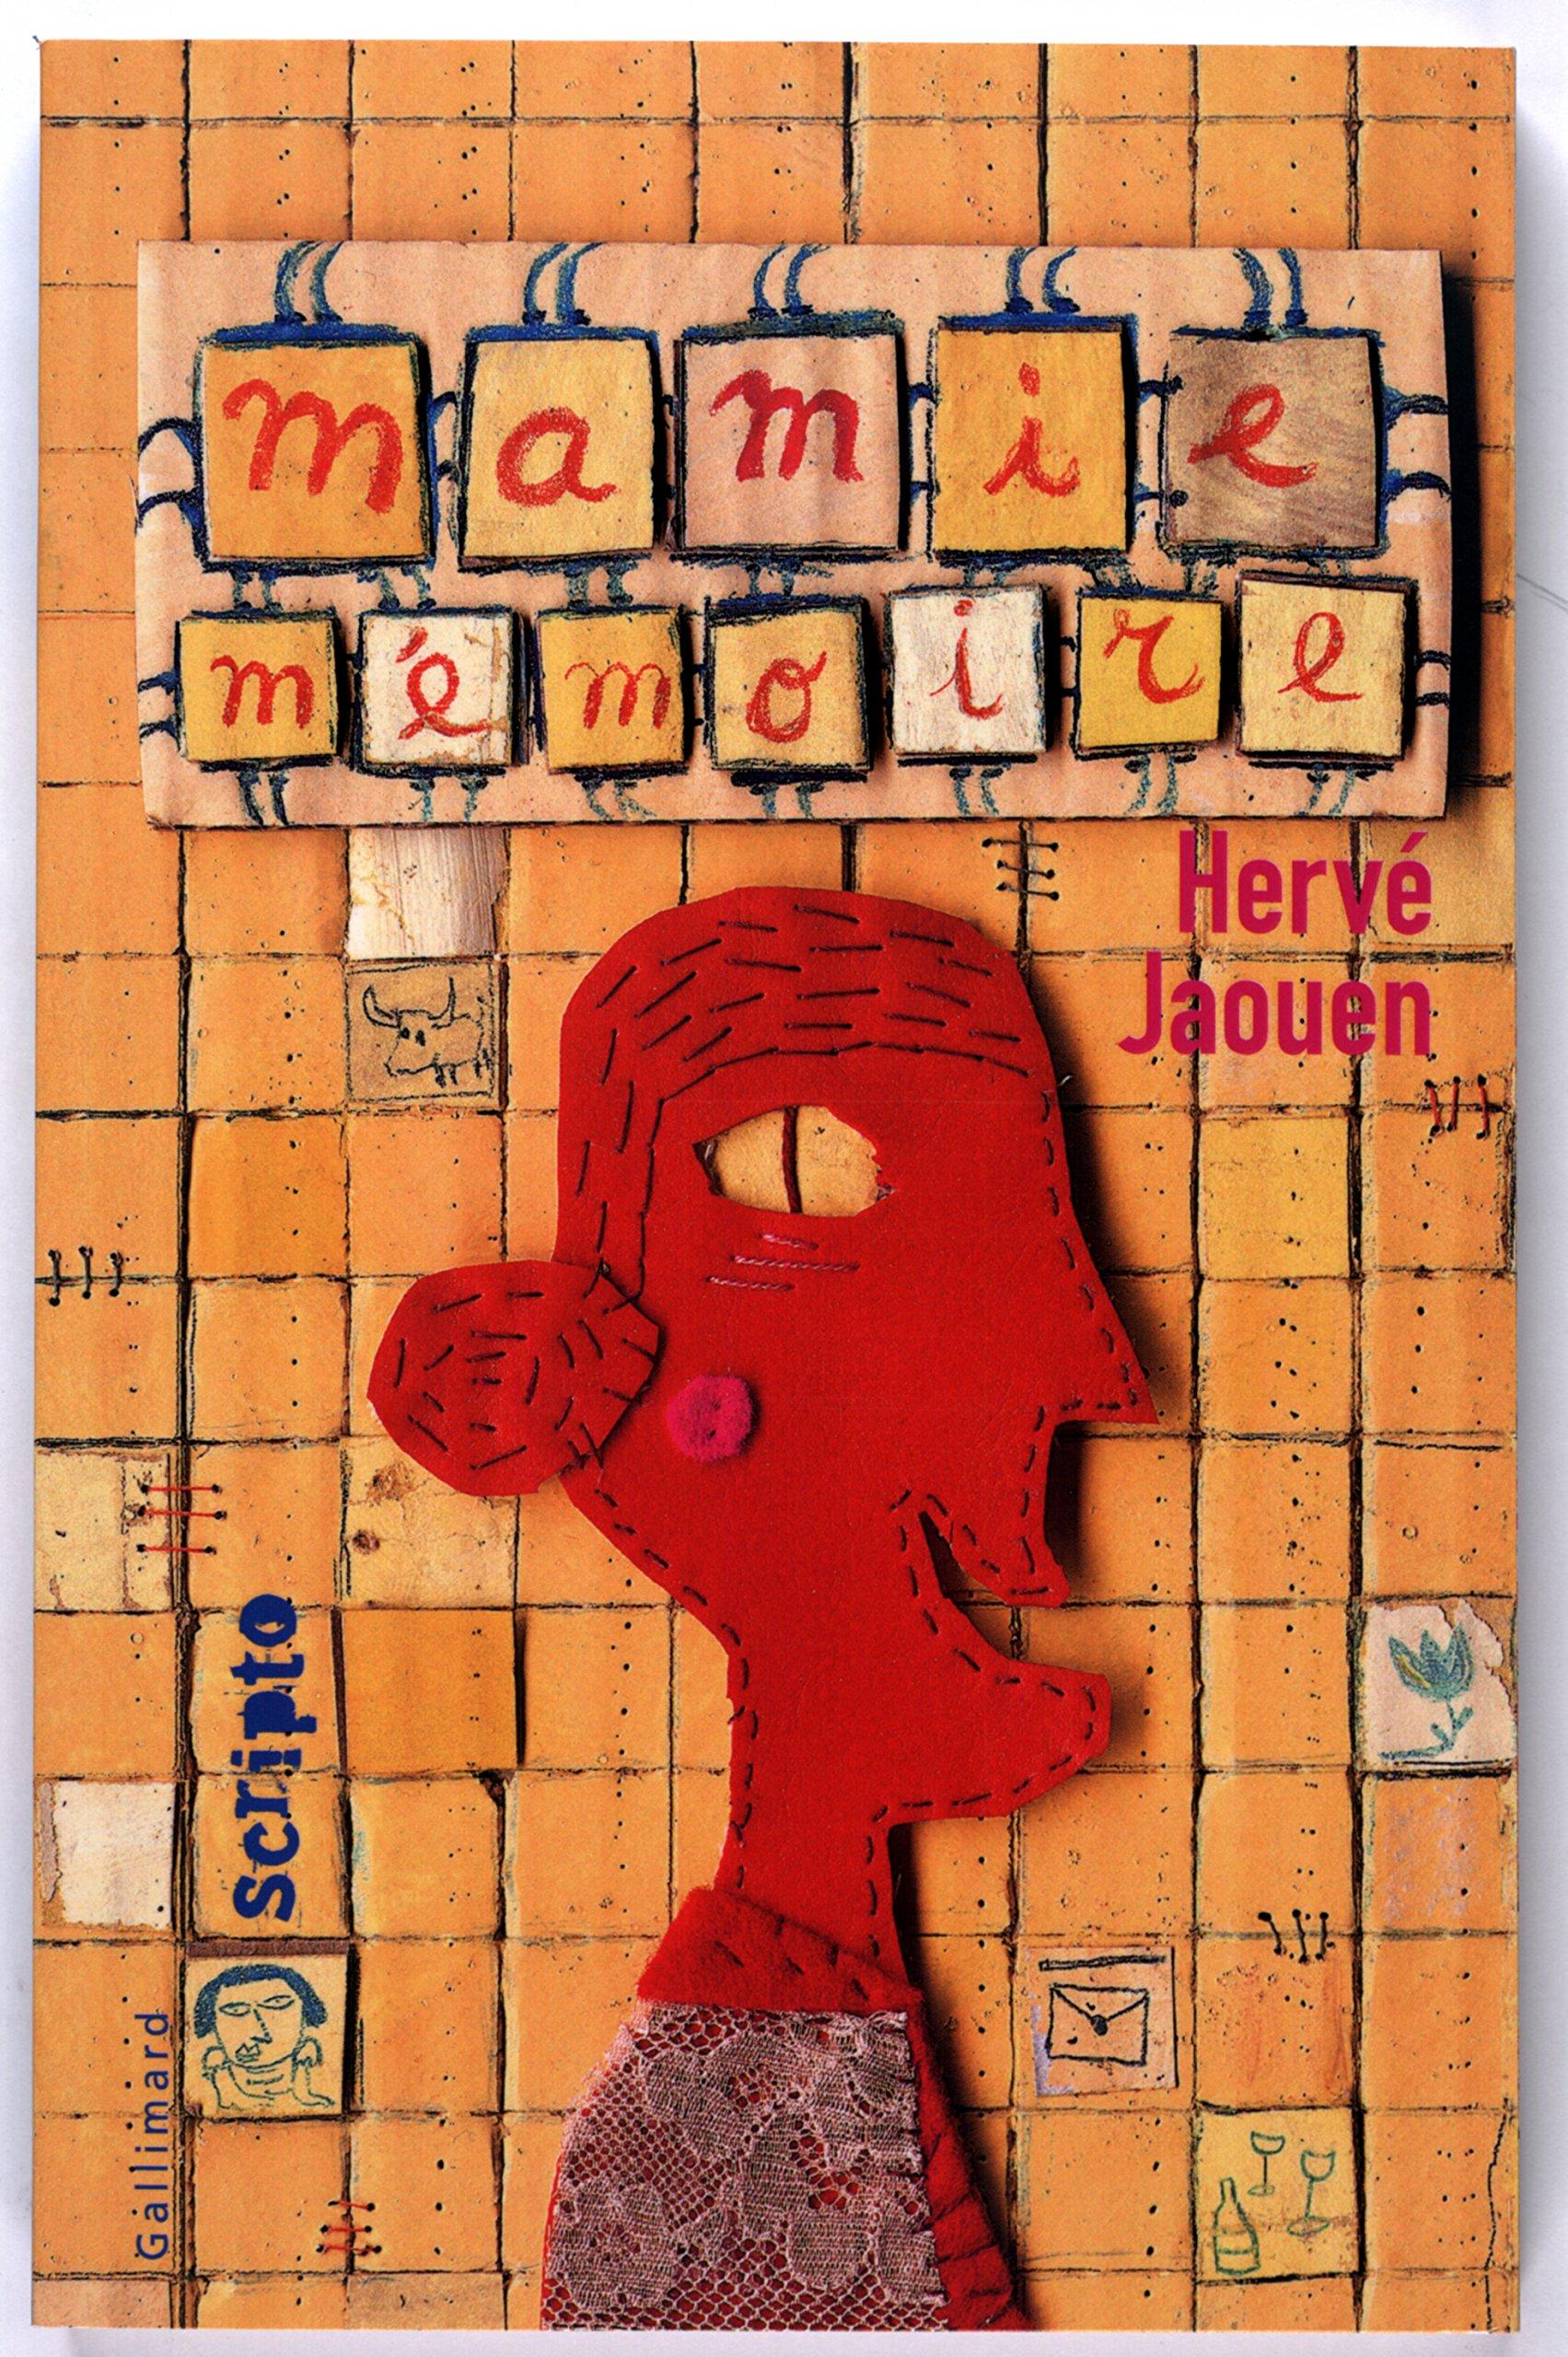 Mamie mémoire (Scripto Jeune)